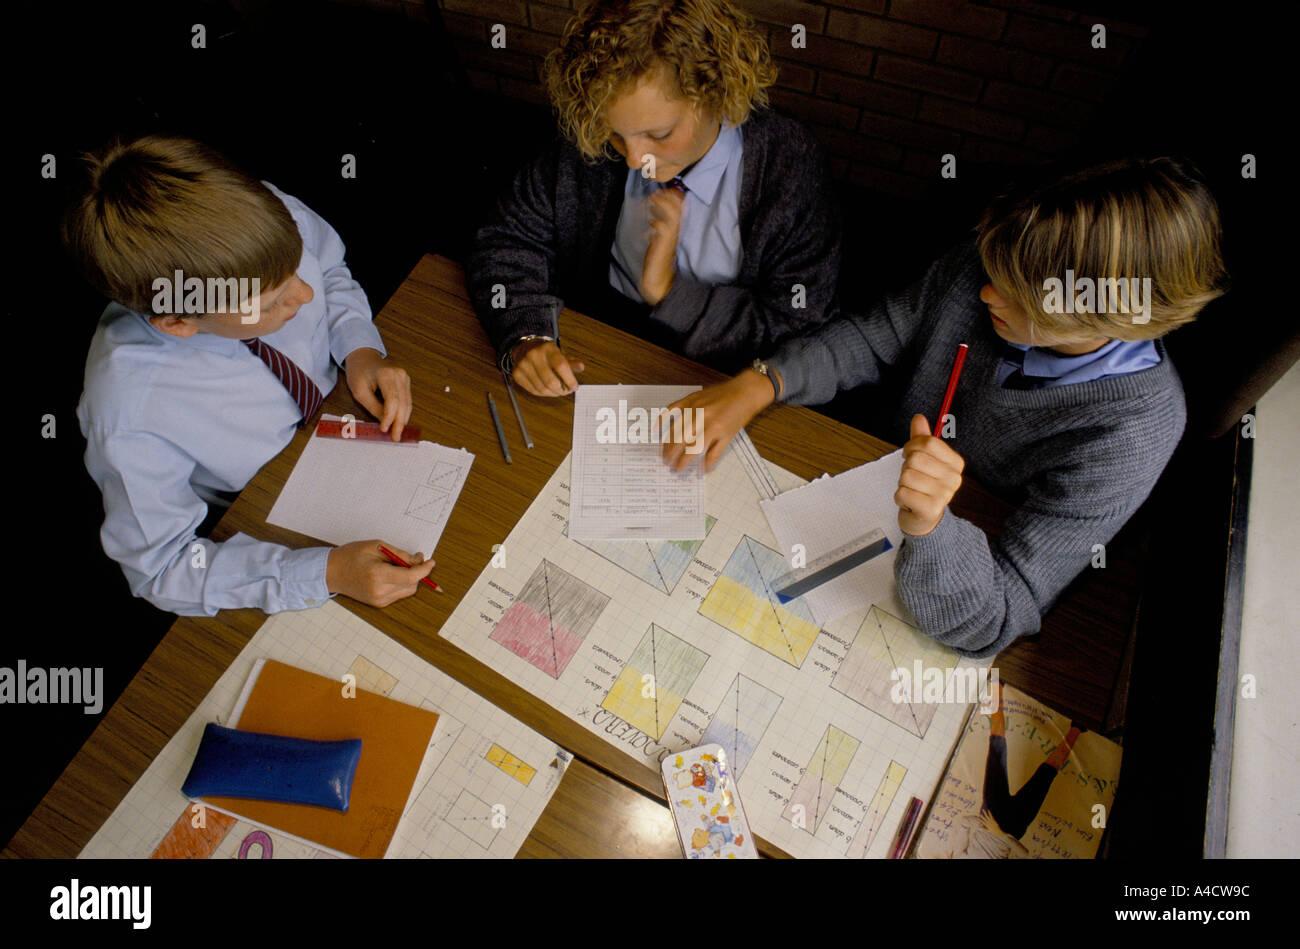 write dissertation acknowledgement mail for interviews